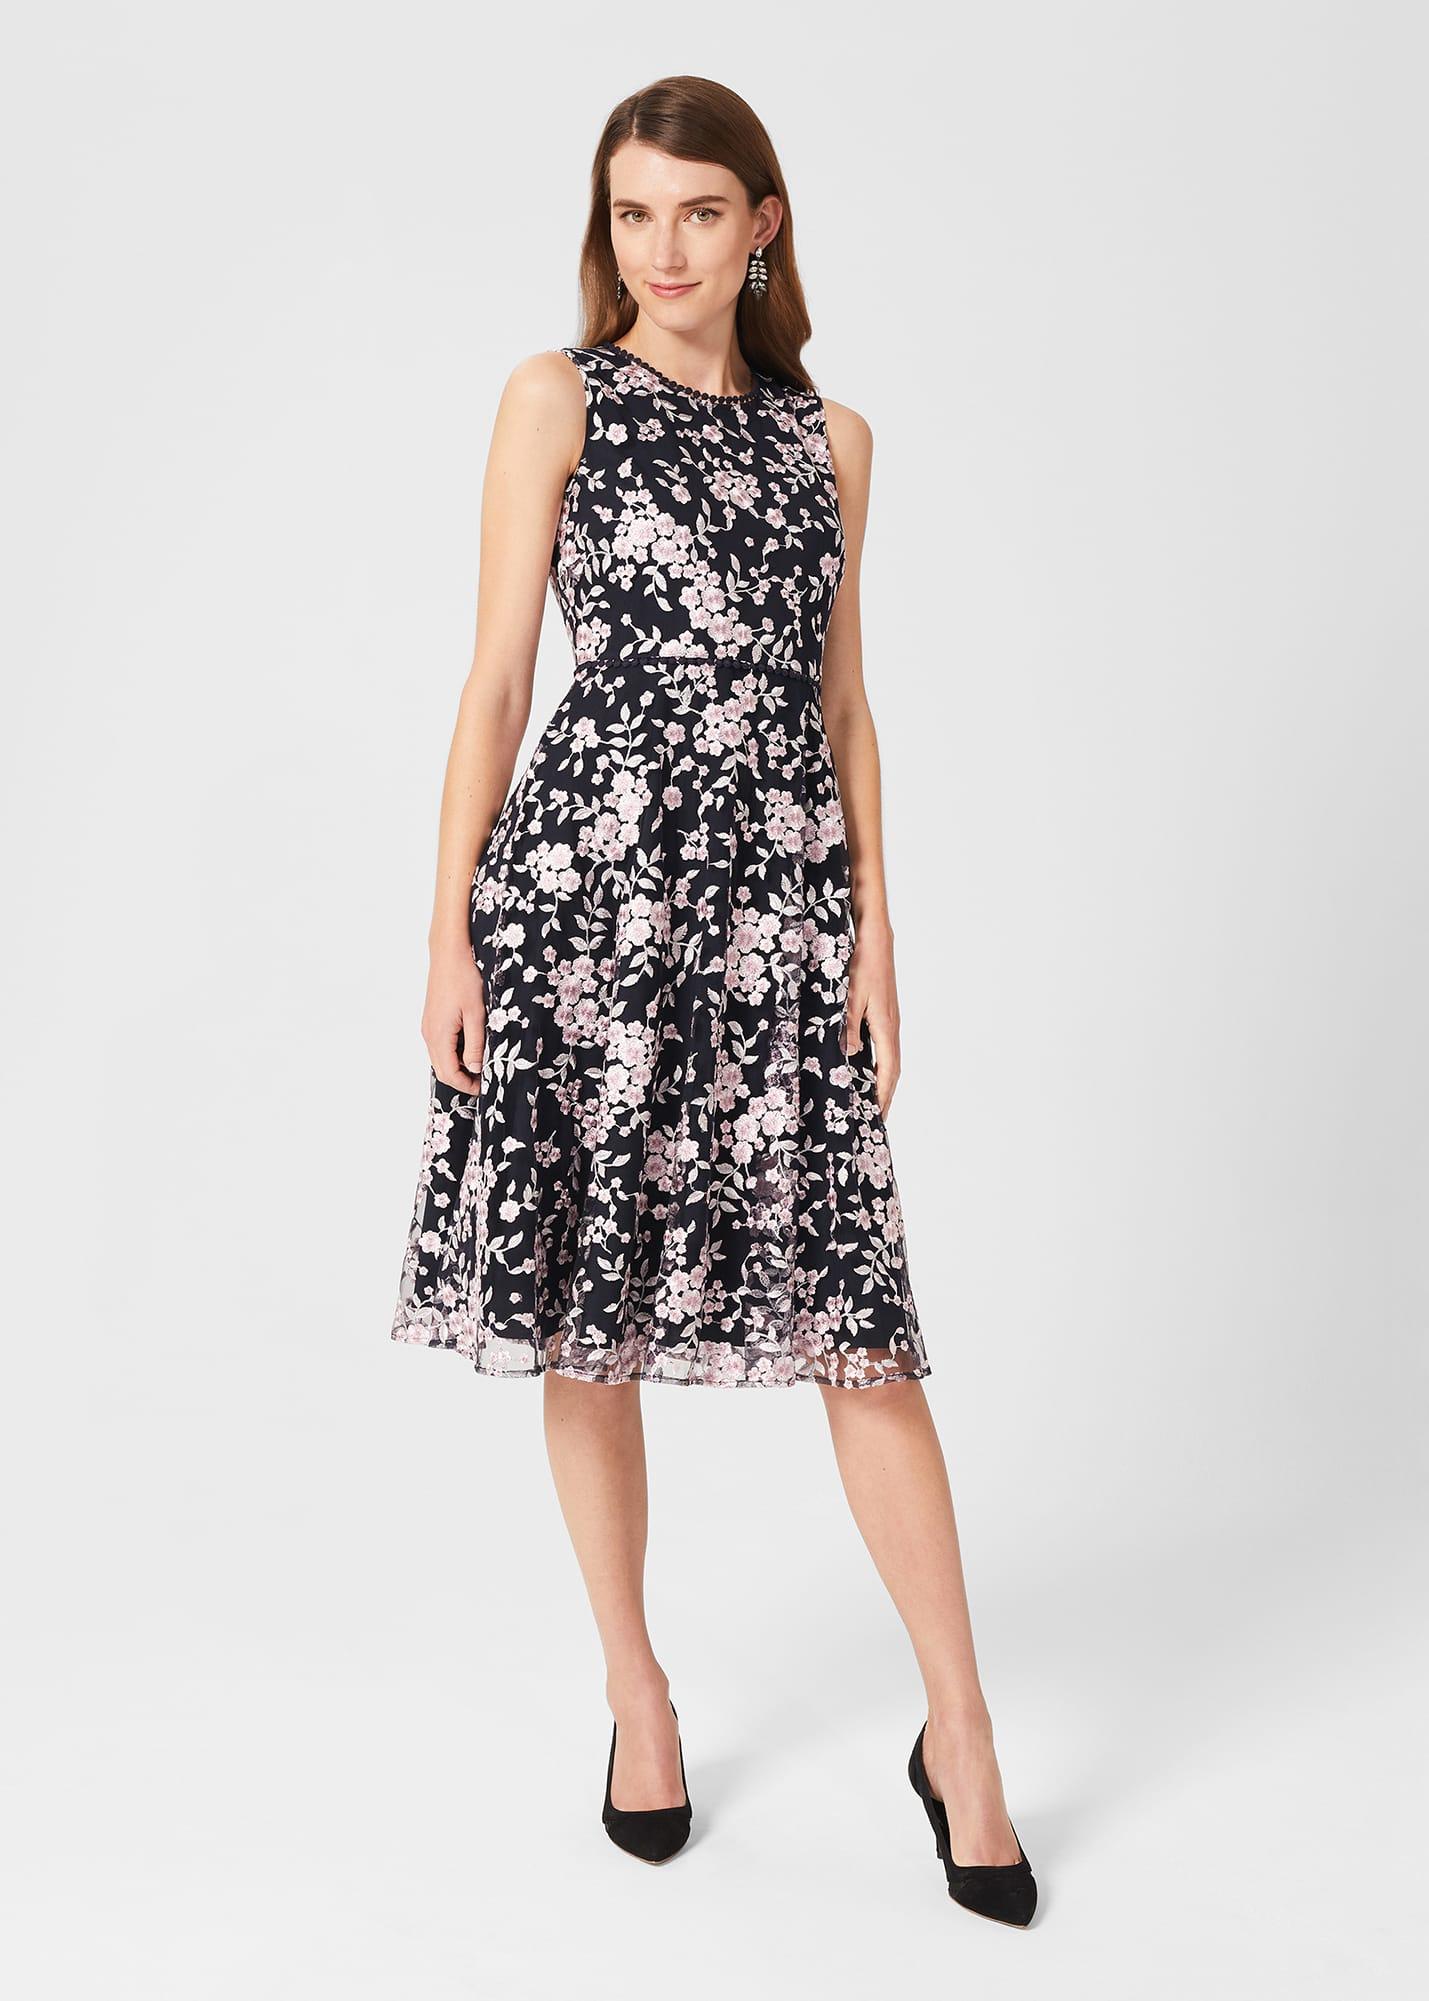 Hobbs Women Scarlett Embroidered Dress